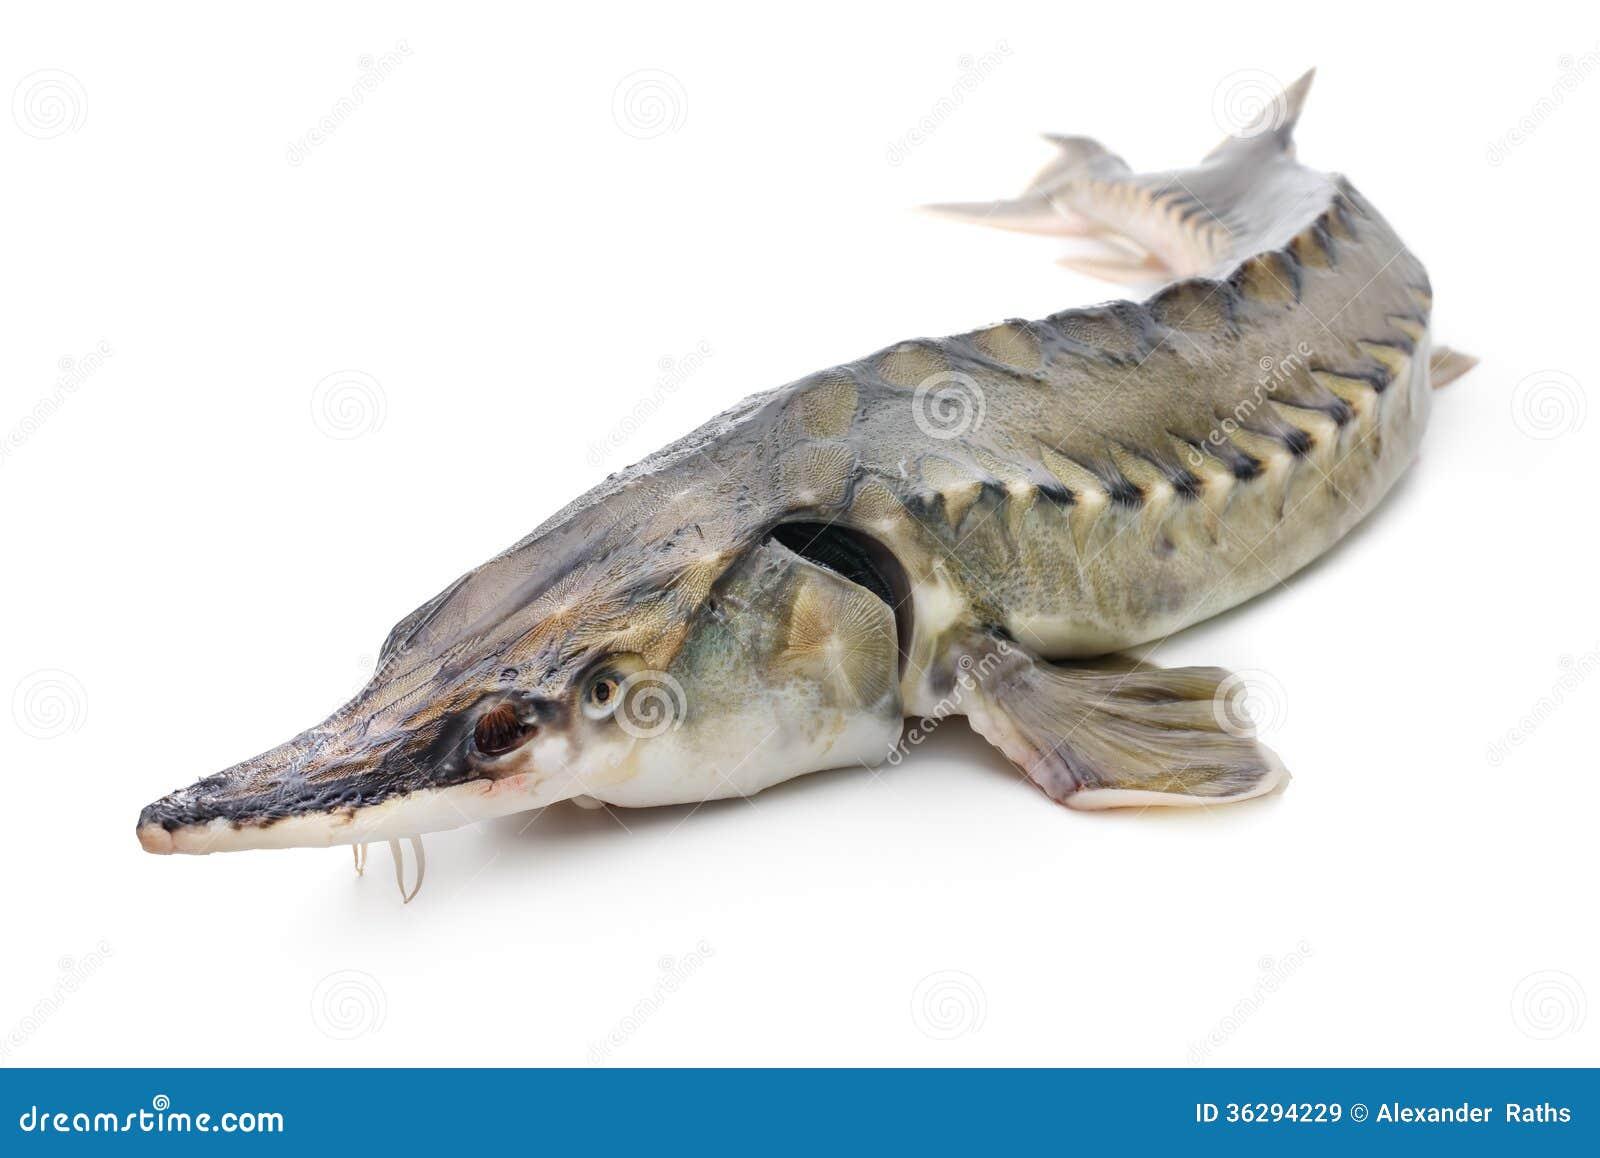 Sturgeon fish stock image image of caviar animals fish for Black caviar fish